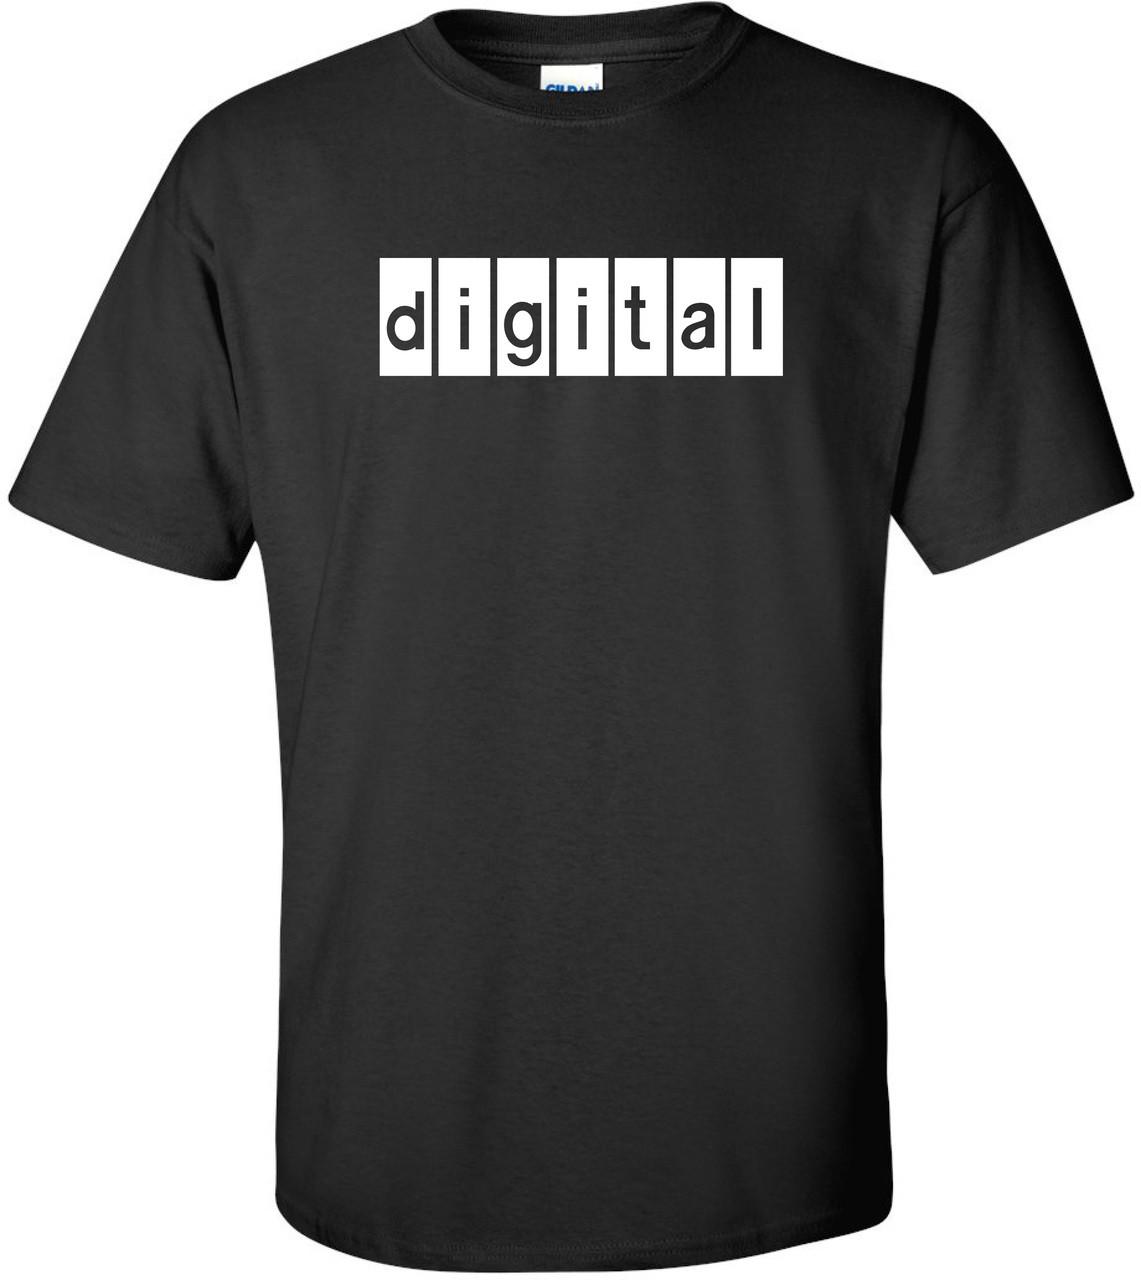 300ccdeb Digital Equipment Corp Retro Logo T-Shirt. $25.99 $13.99. (You save  $12.00). Black